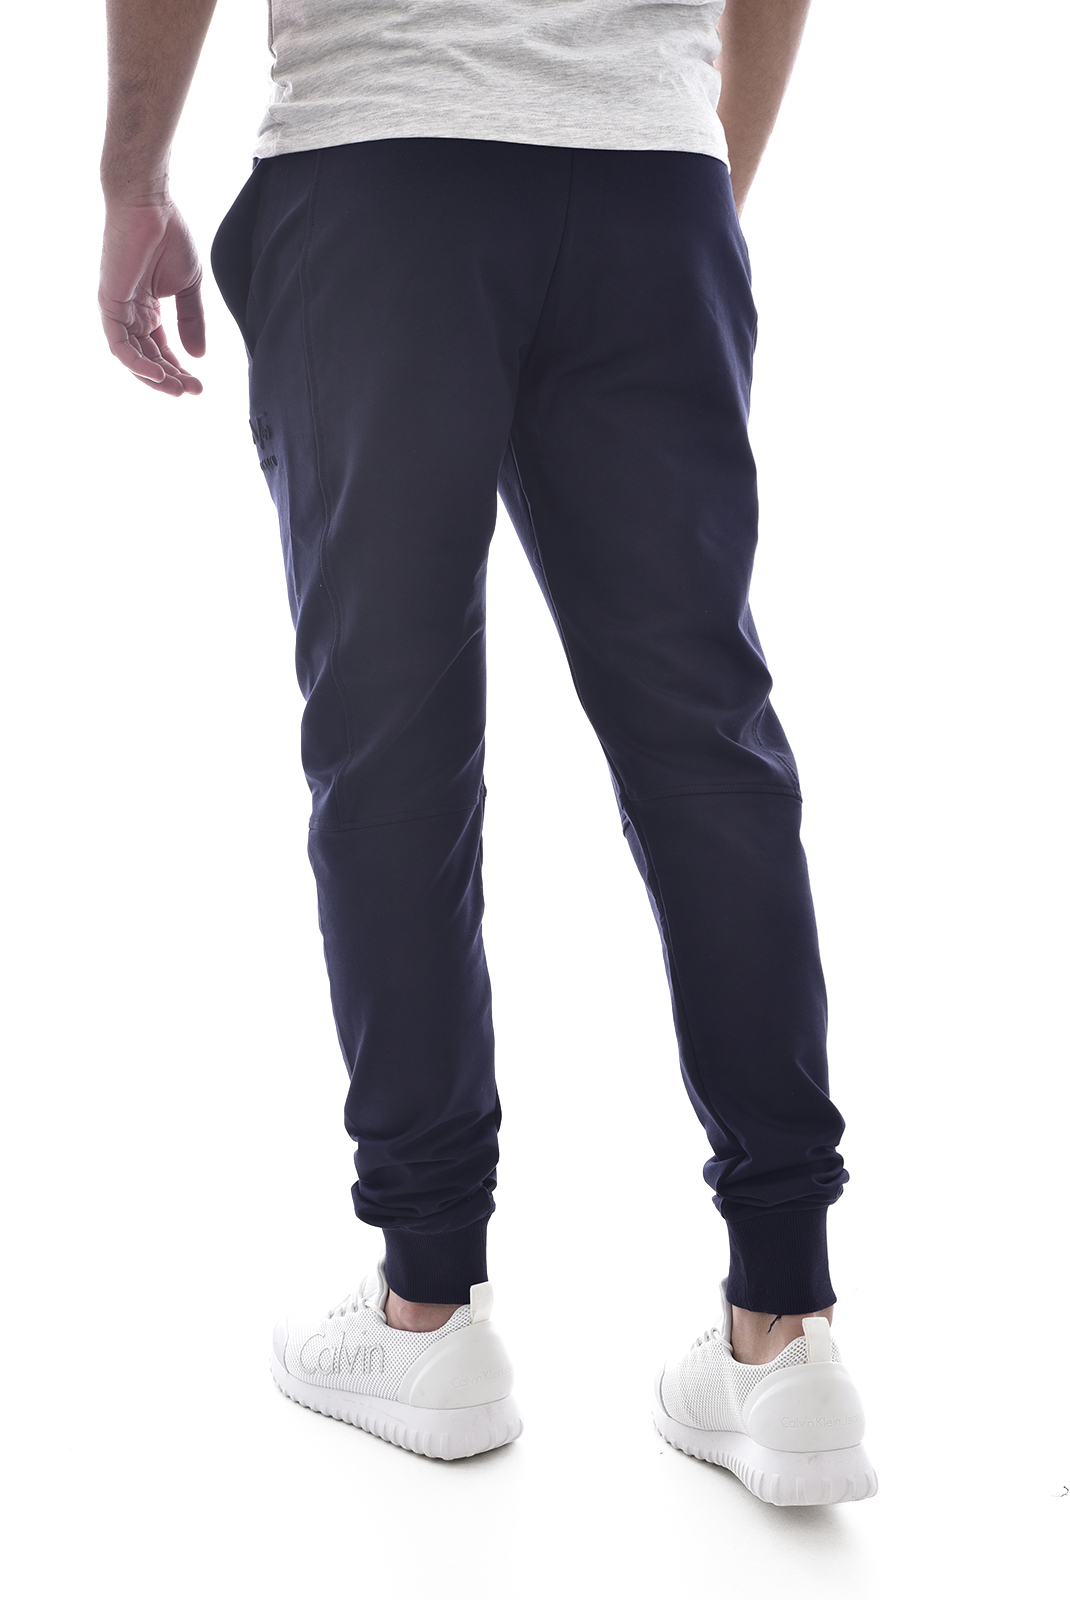 Pantalons sport/streetwear  19V69 by Versace 1969 bosa jog BLEU